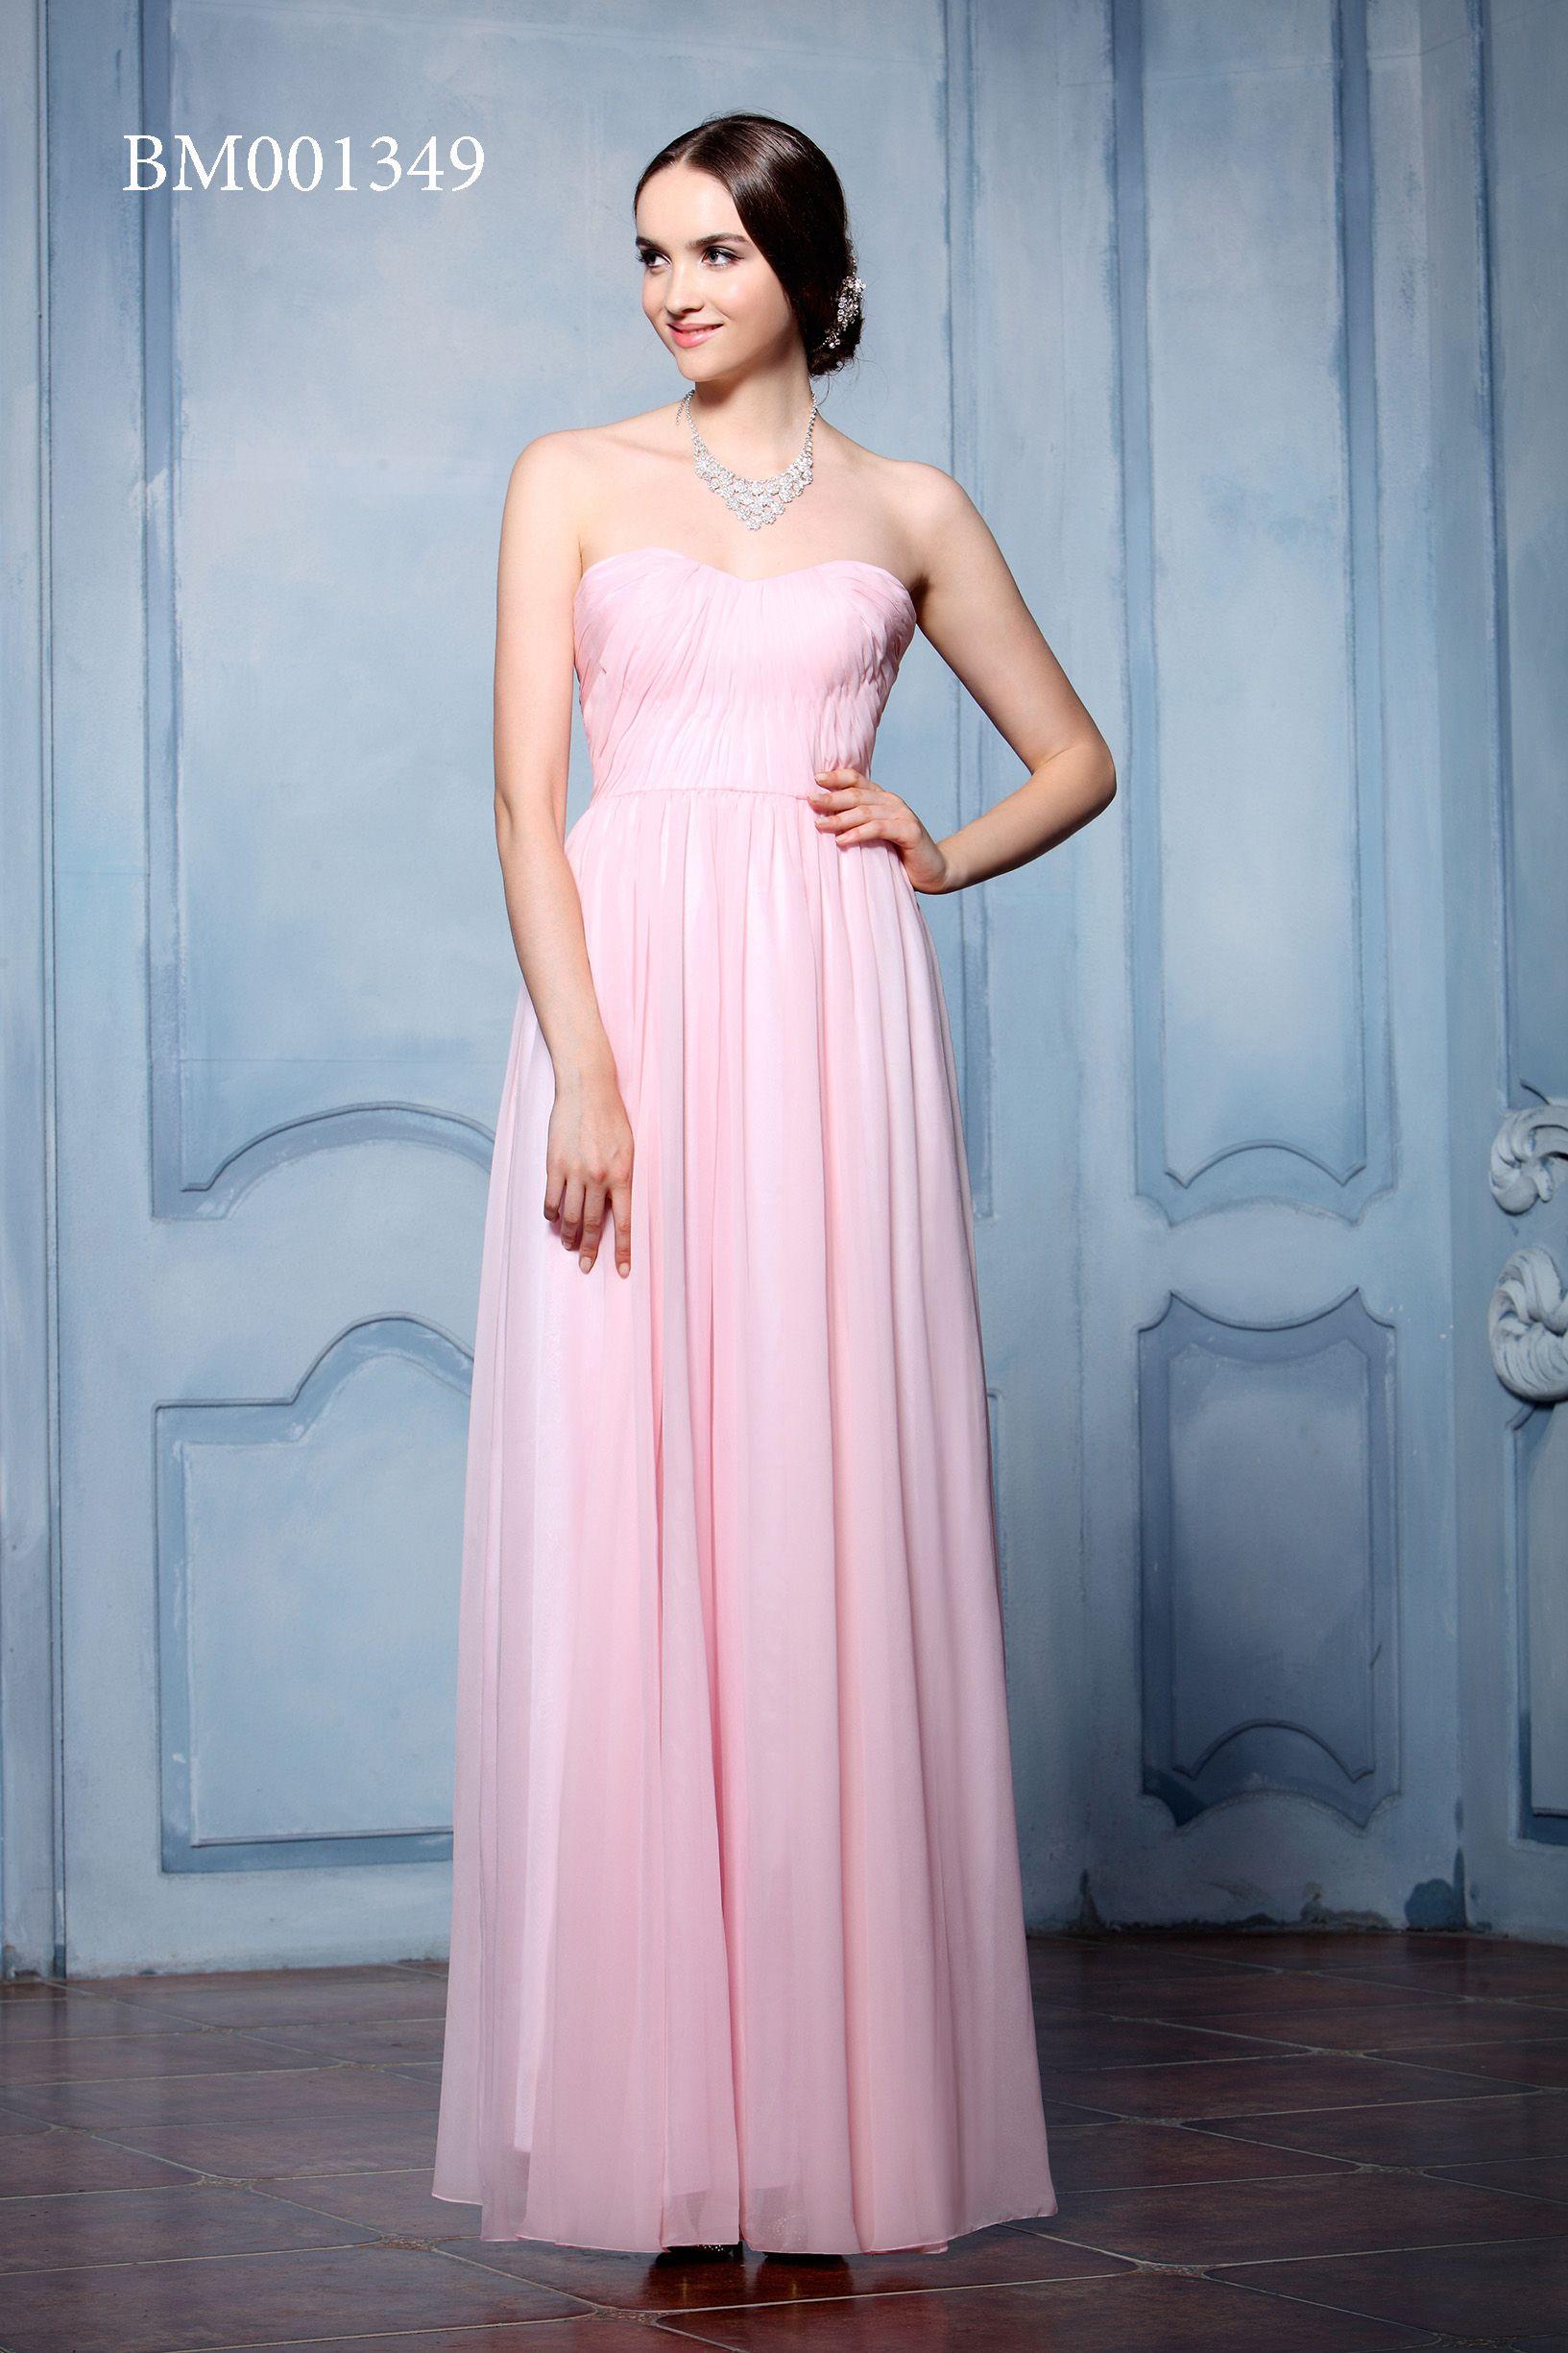 Gorgeous baby pink bridesmaids strapless dress